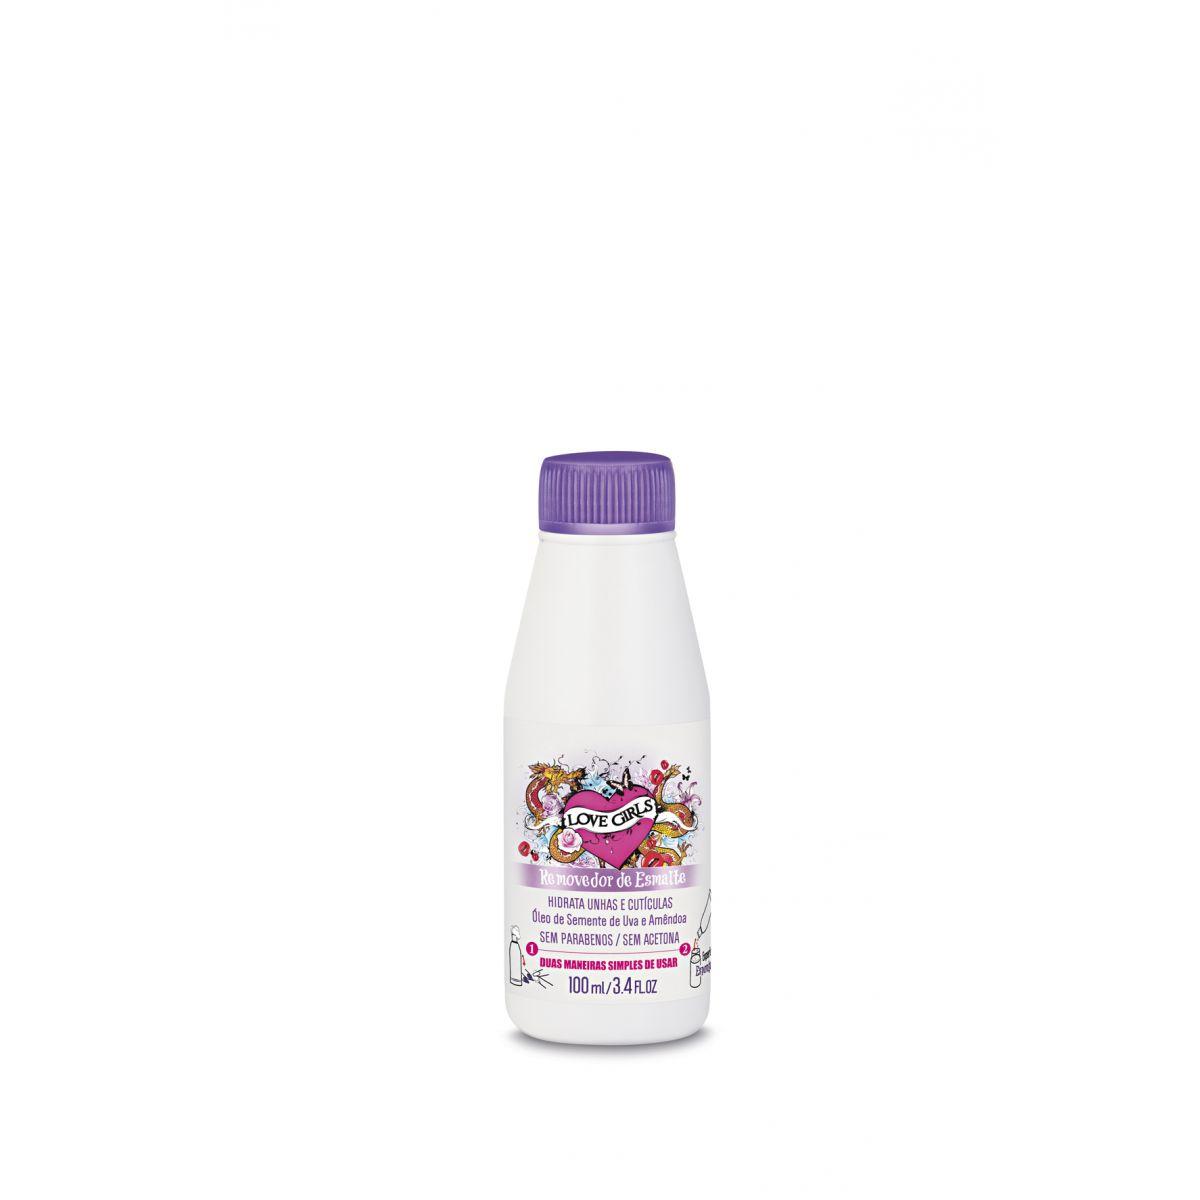 Removedor de Esmaltes Óleo de Uva e Amêndoa - 100 ml